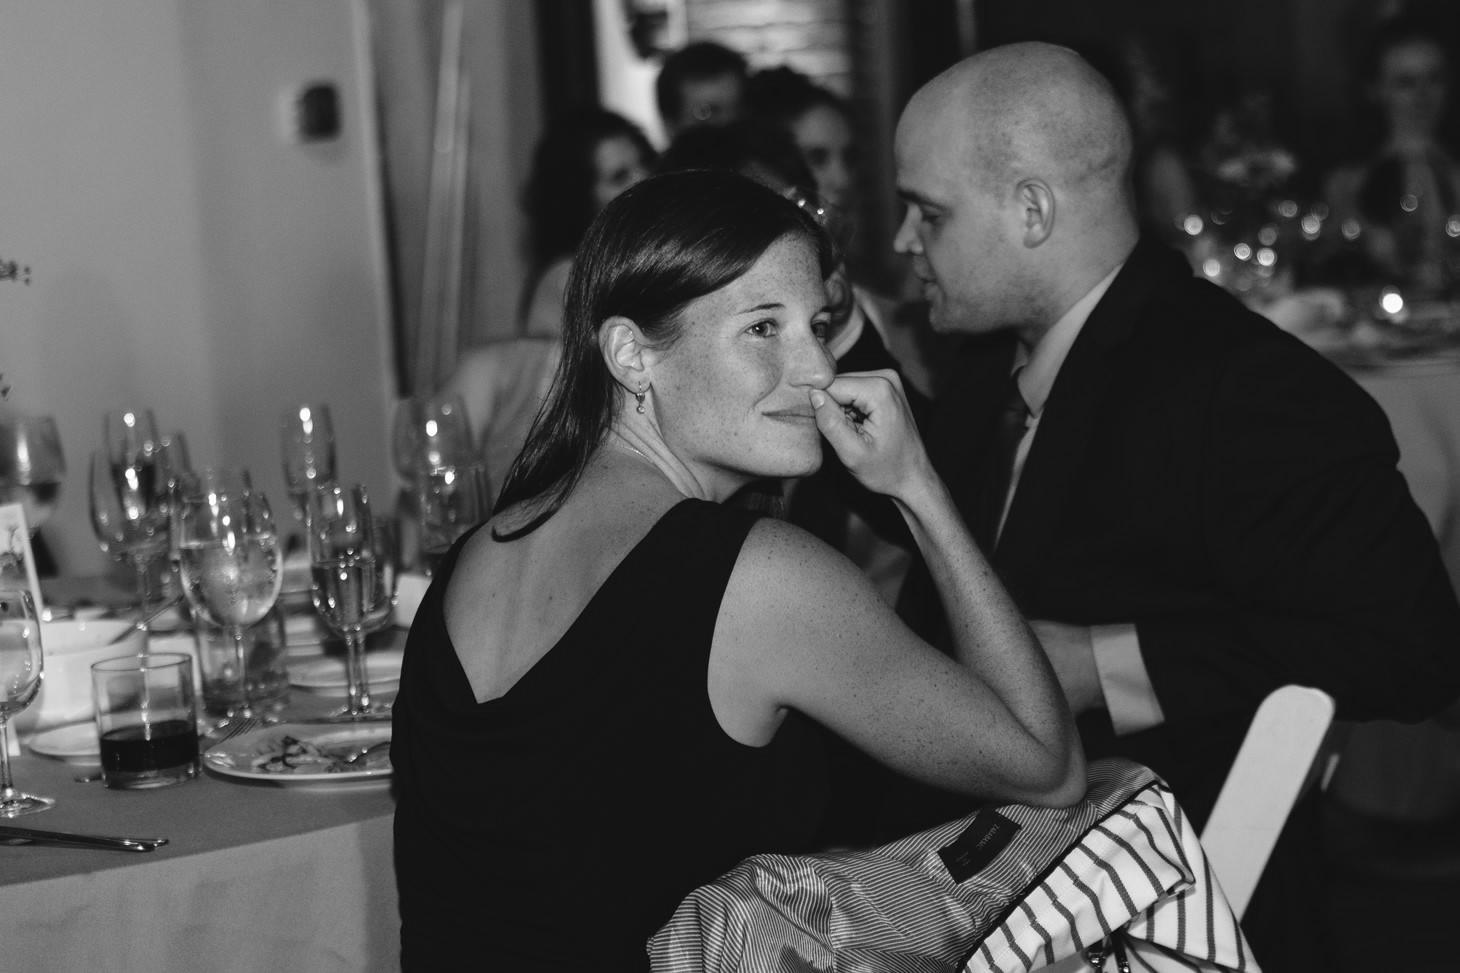 041-nyc-dumbo-loft-brooklyn-wedding-photographer-smitten-chickens-photo-.jpg